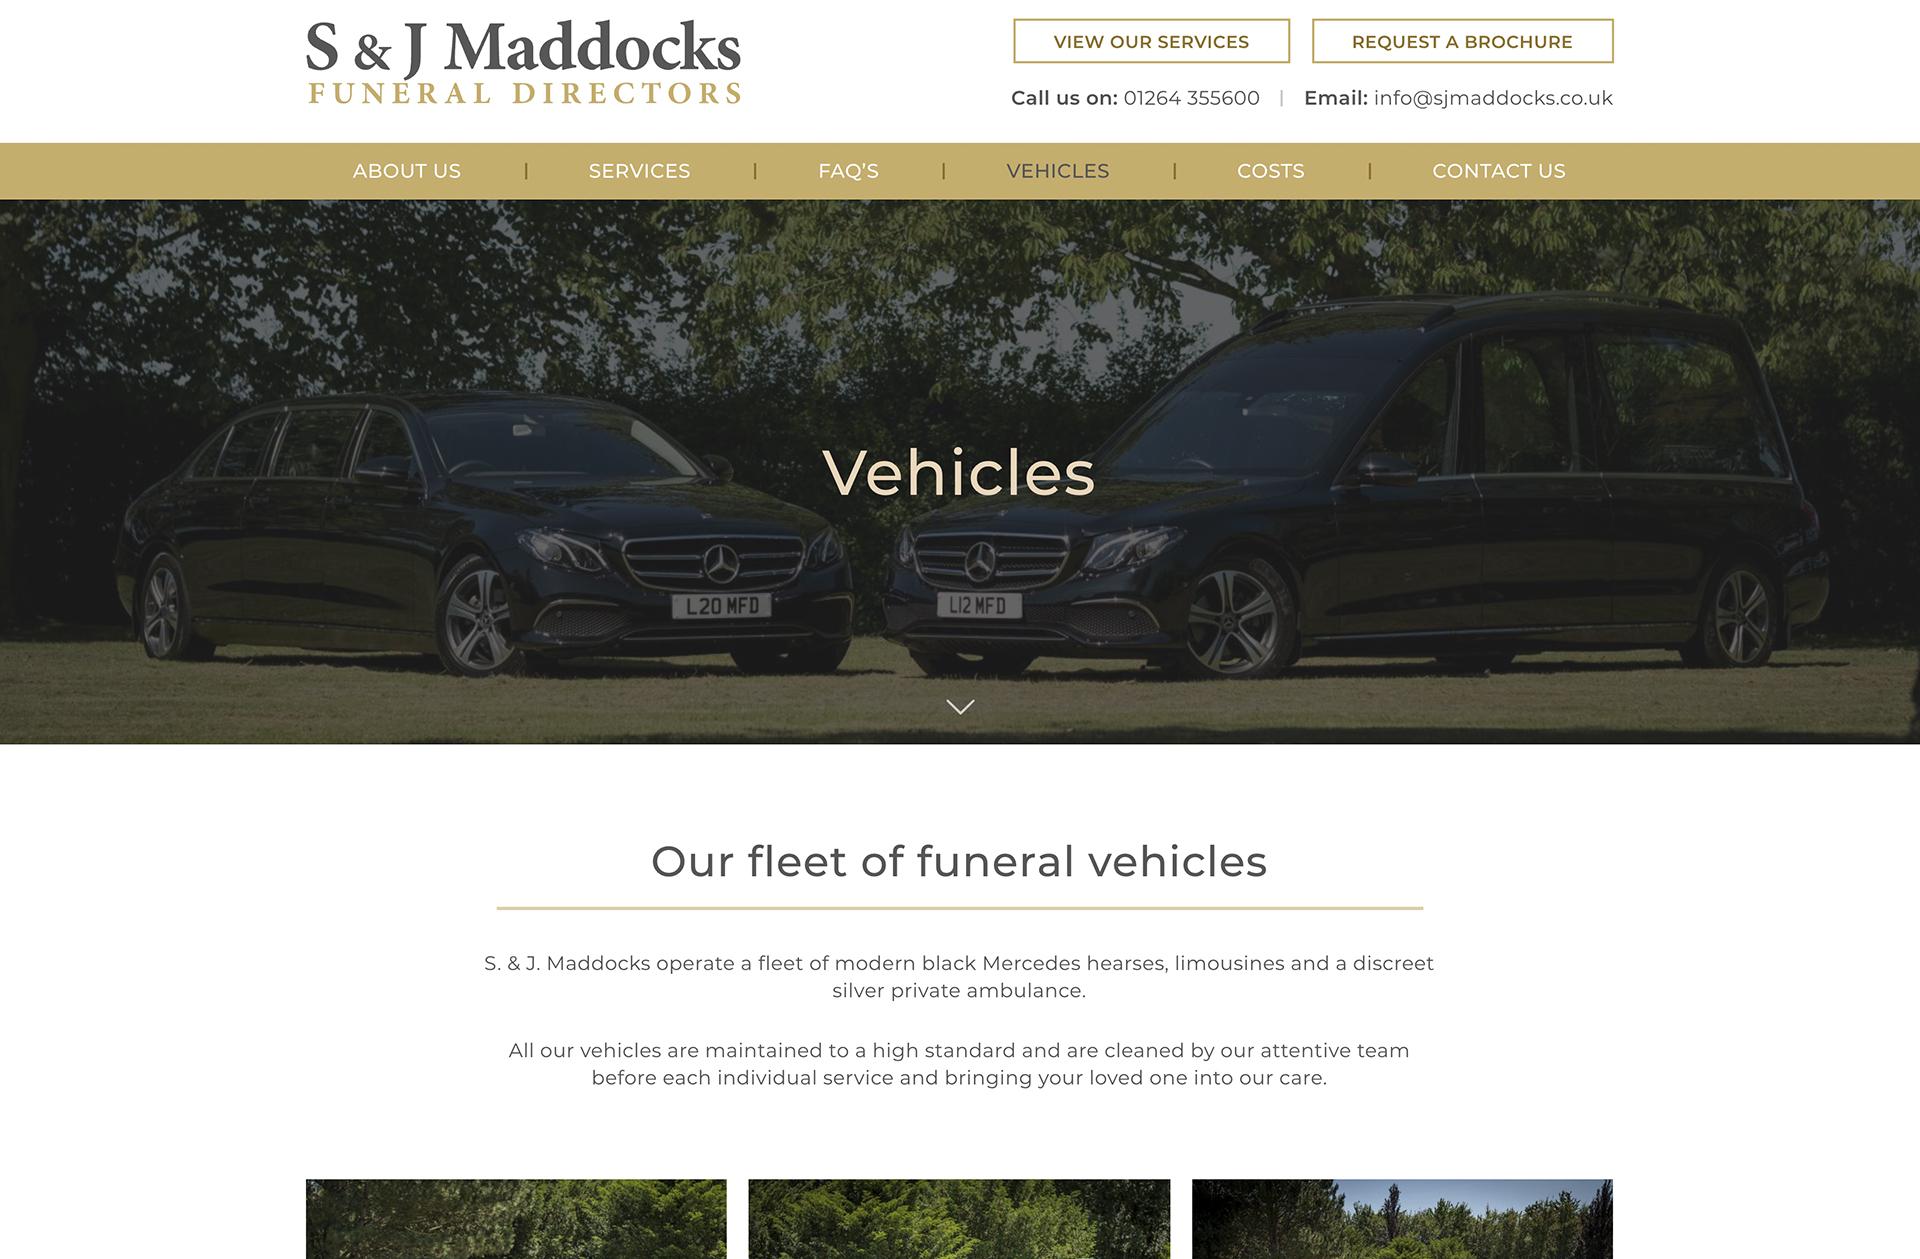 SJ Maddocks Website Design